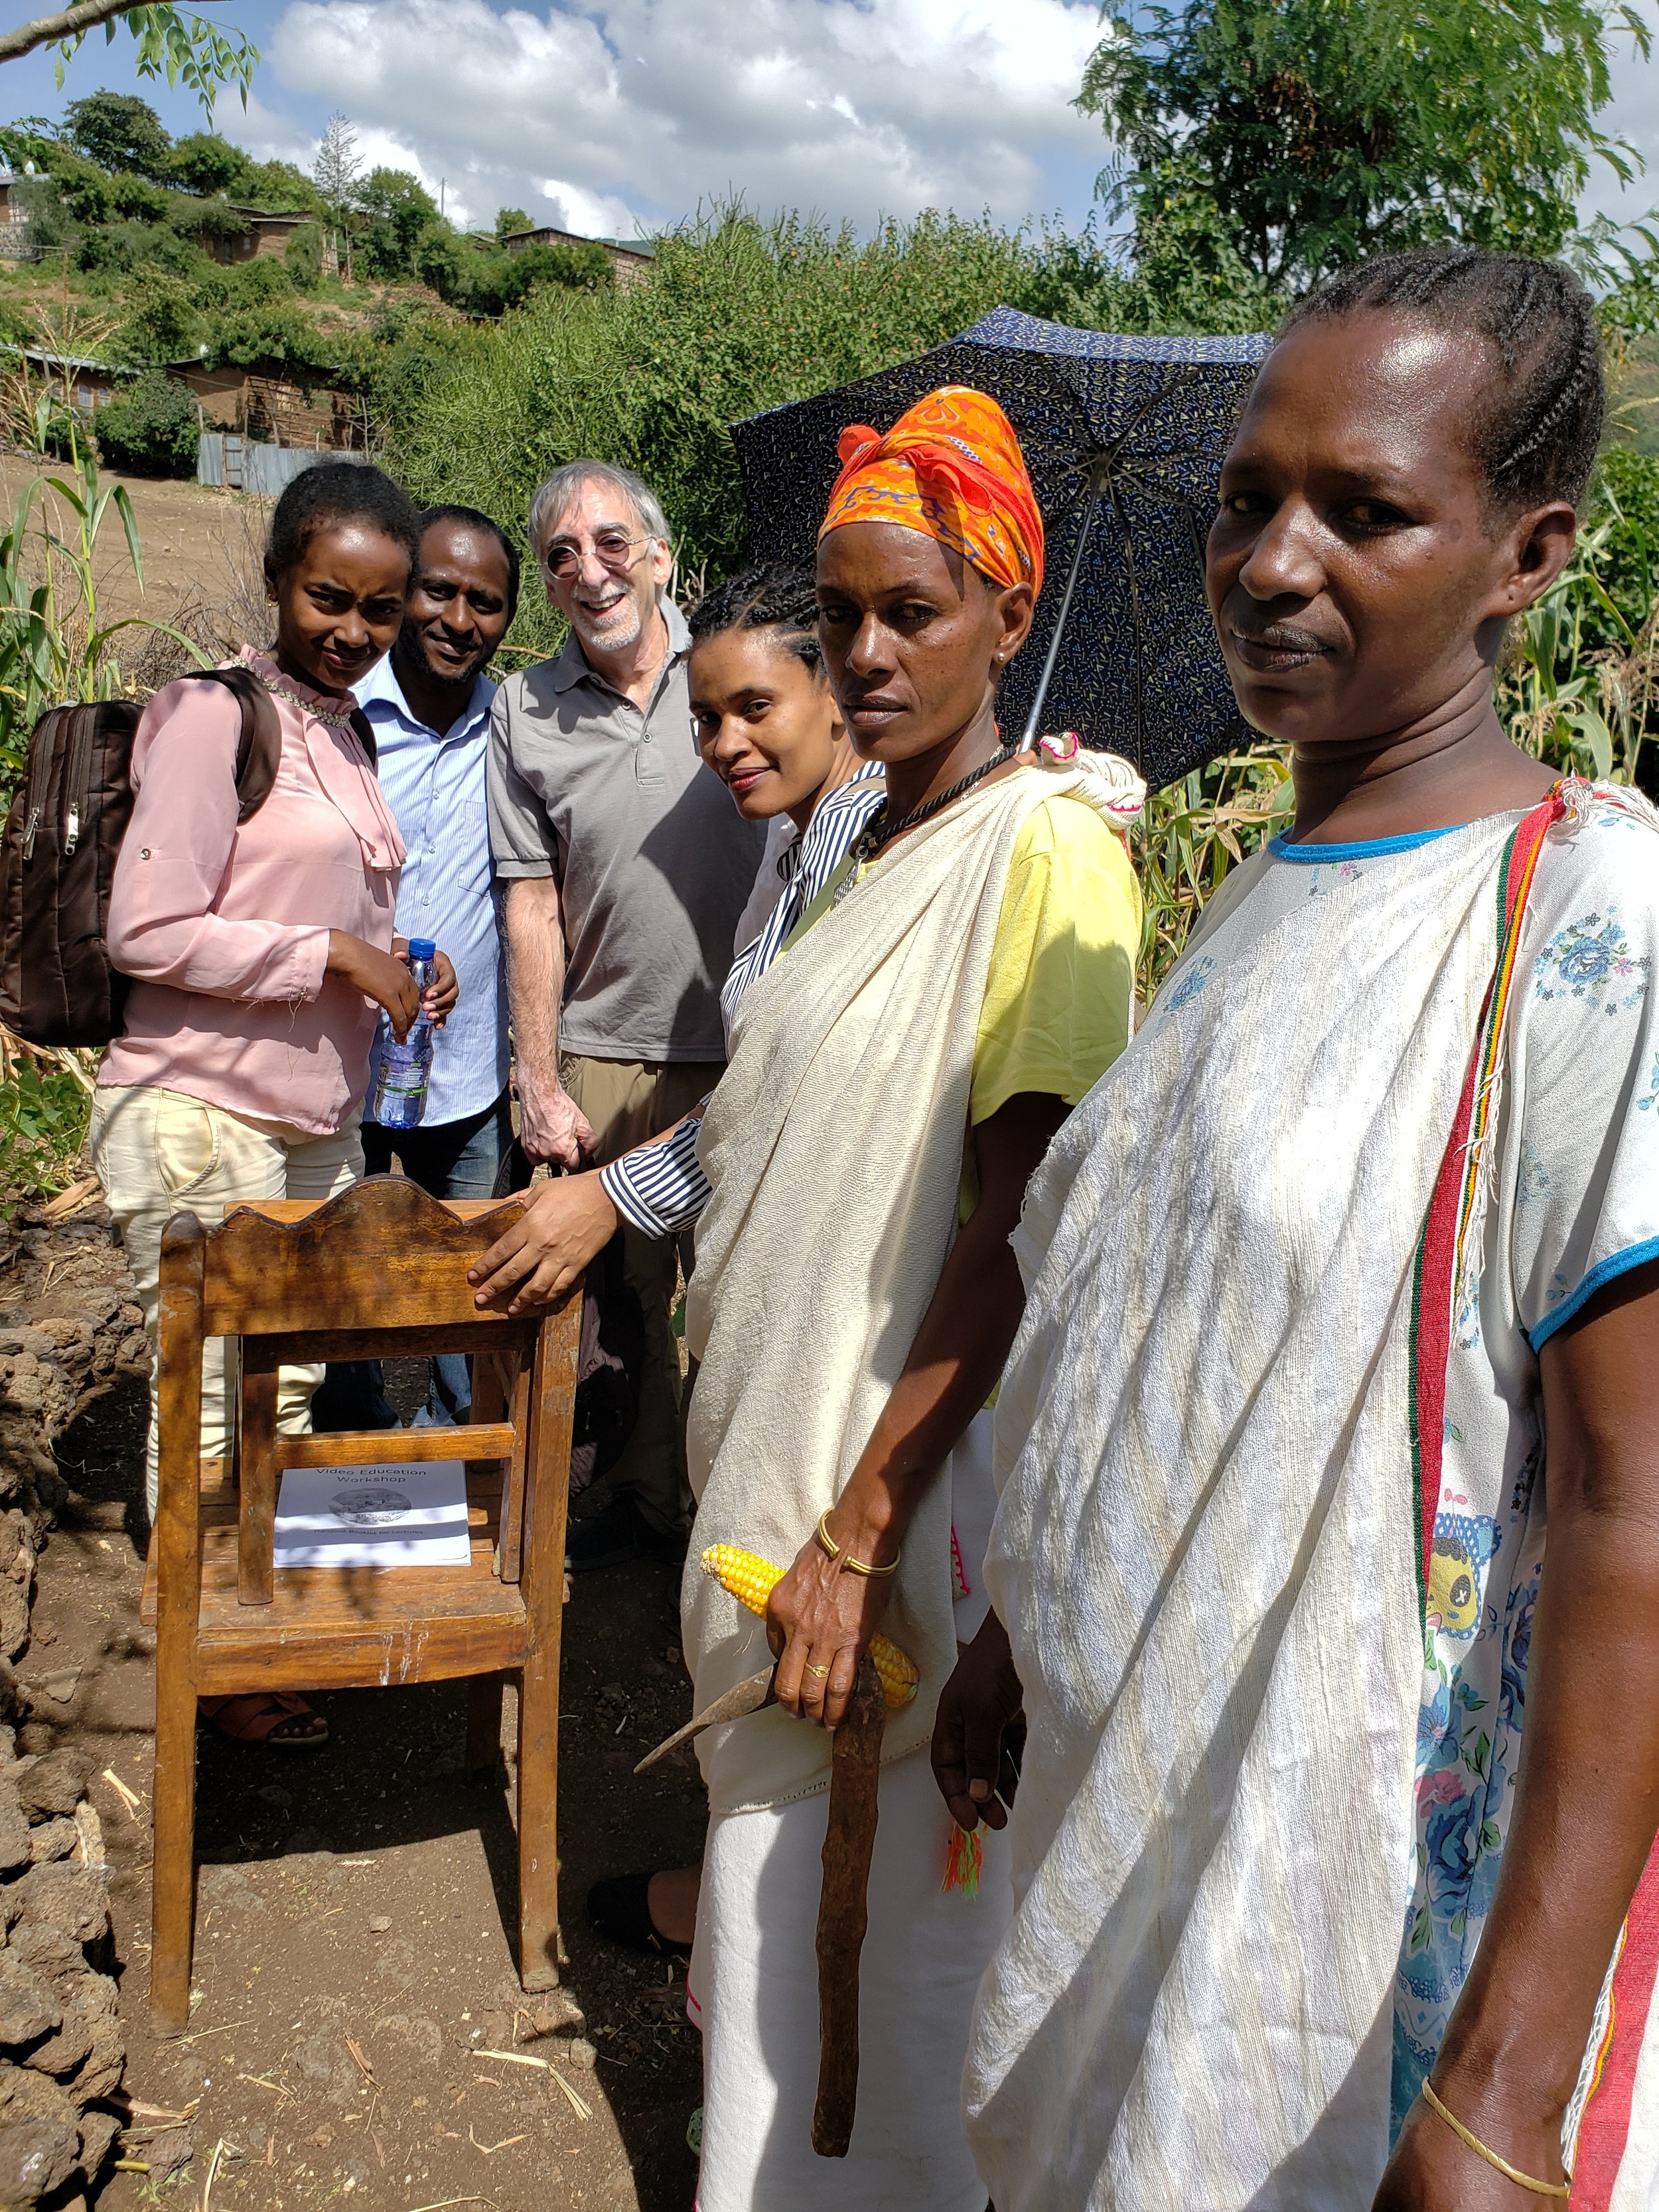 Under-resourced neighborhood in Arba Minch, Ethiopia